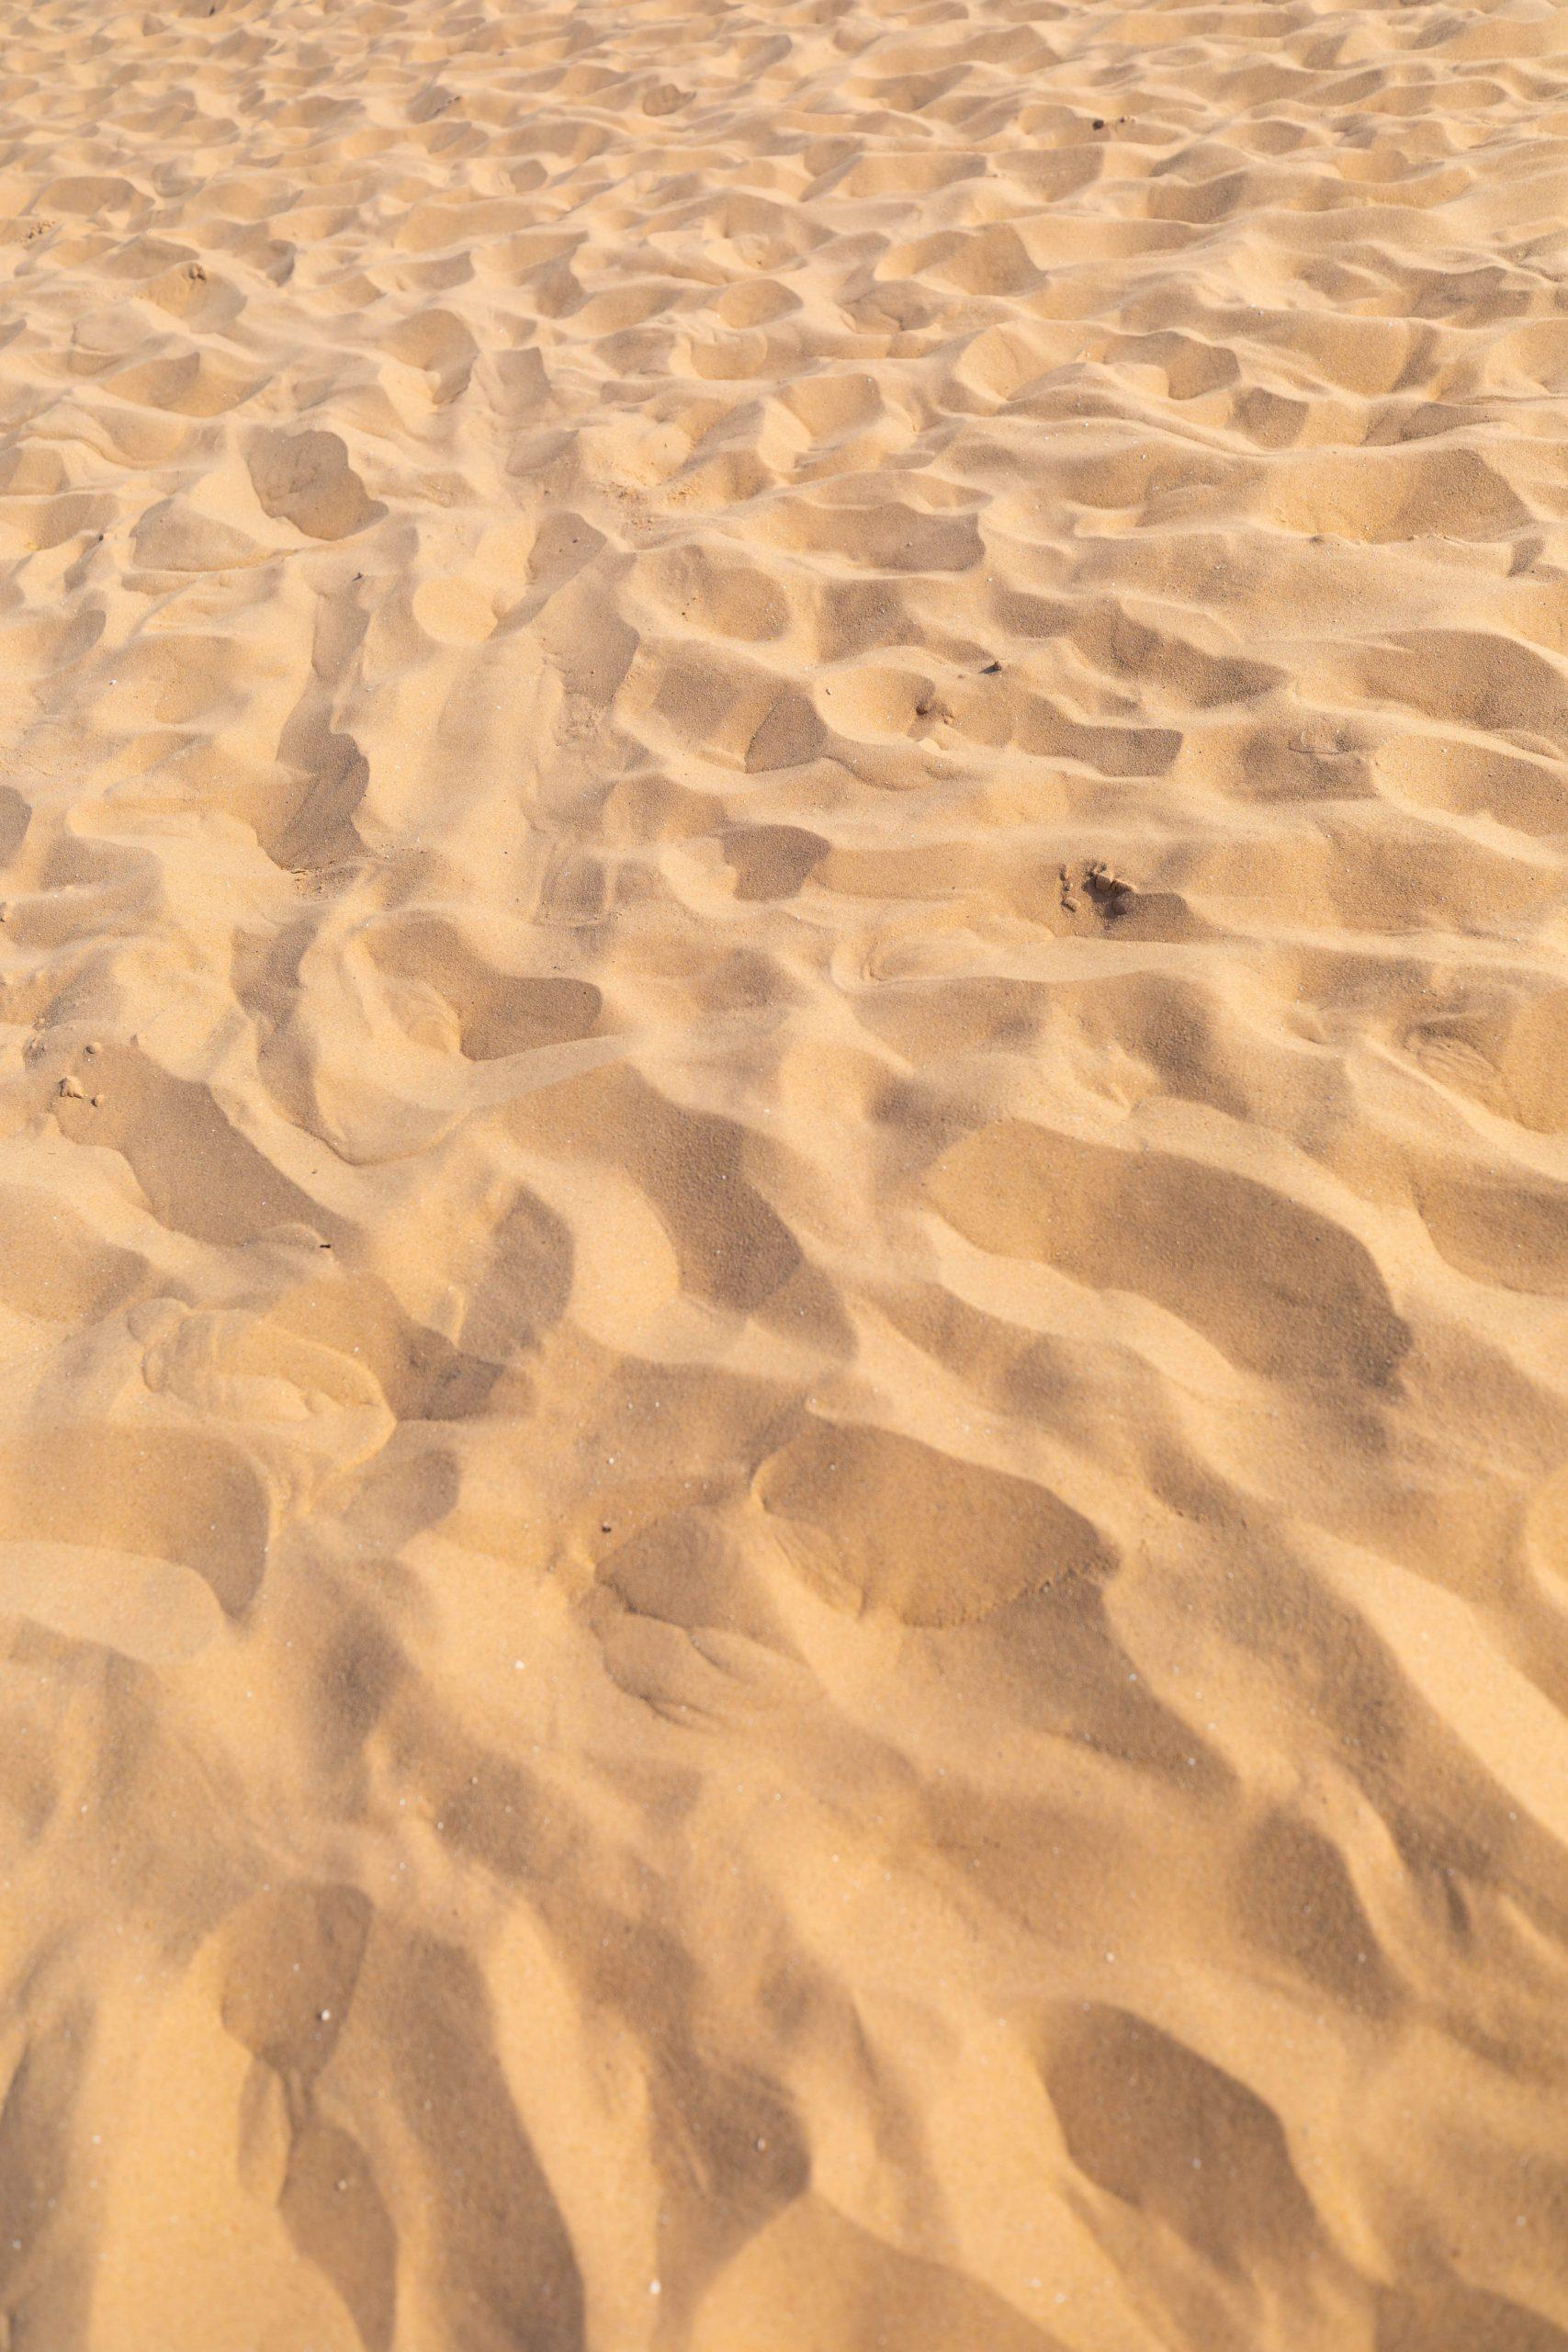 Shifting Sands at Sunset at Sleeping Bear Dunes National Lakeshore Michigan's Desert Beach by Annie Fairfax